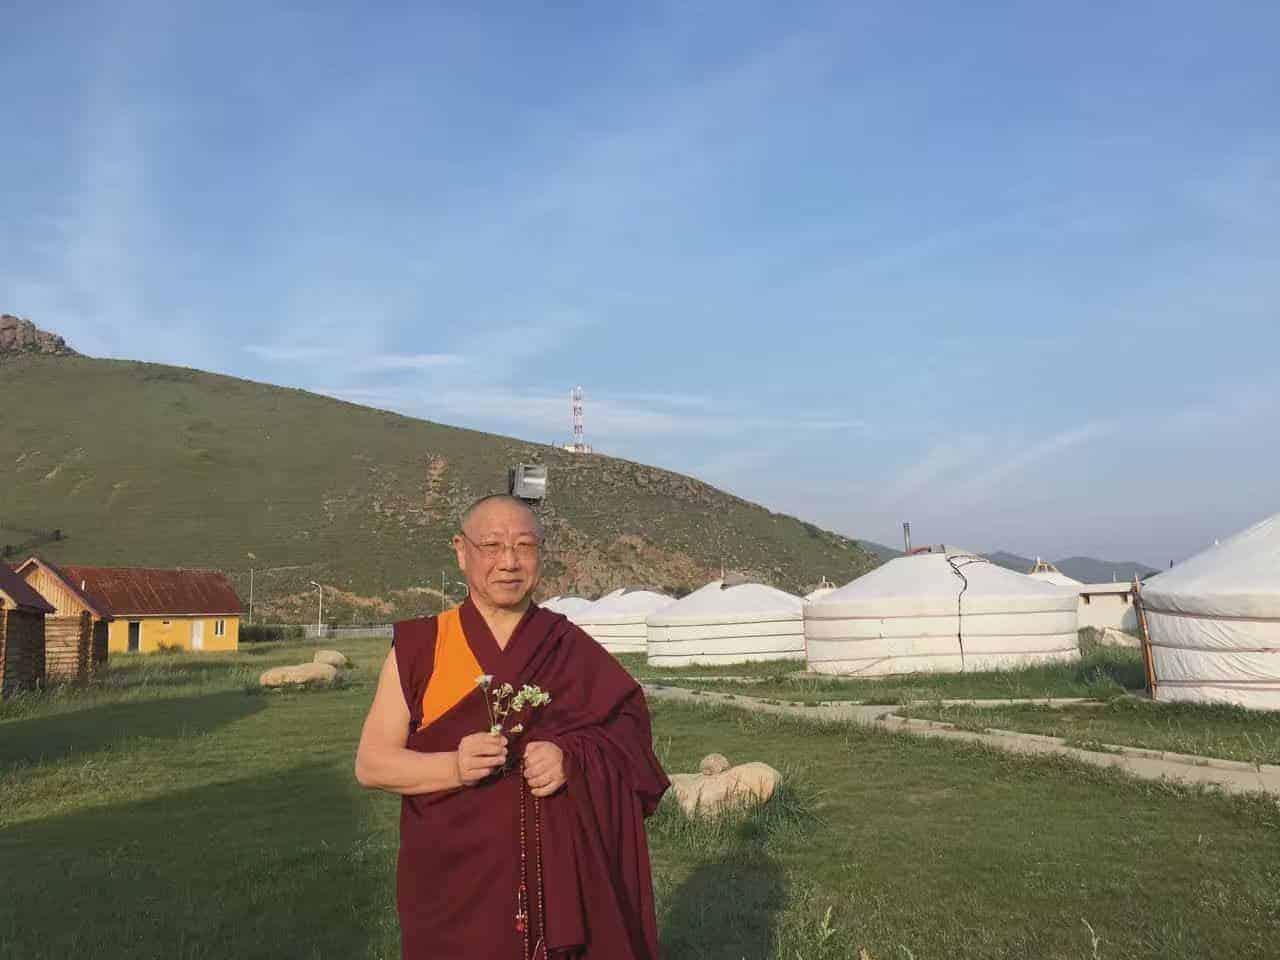 gosok-rinpoche-mongolia-2016-878cf0f19058abd687c1f017b0daa88